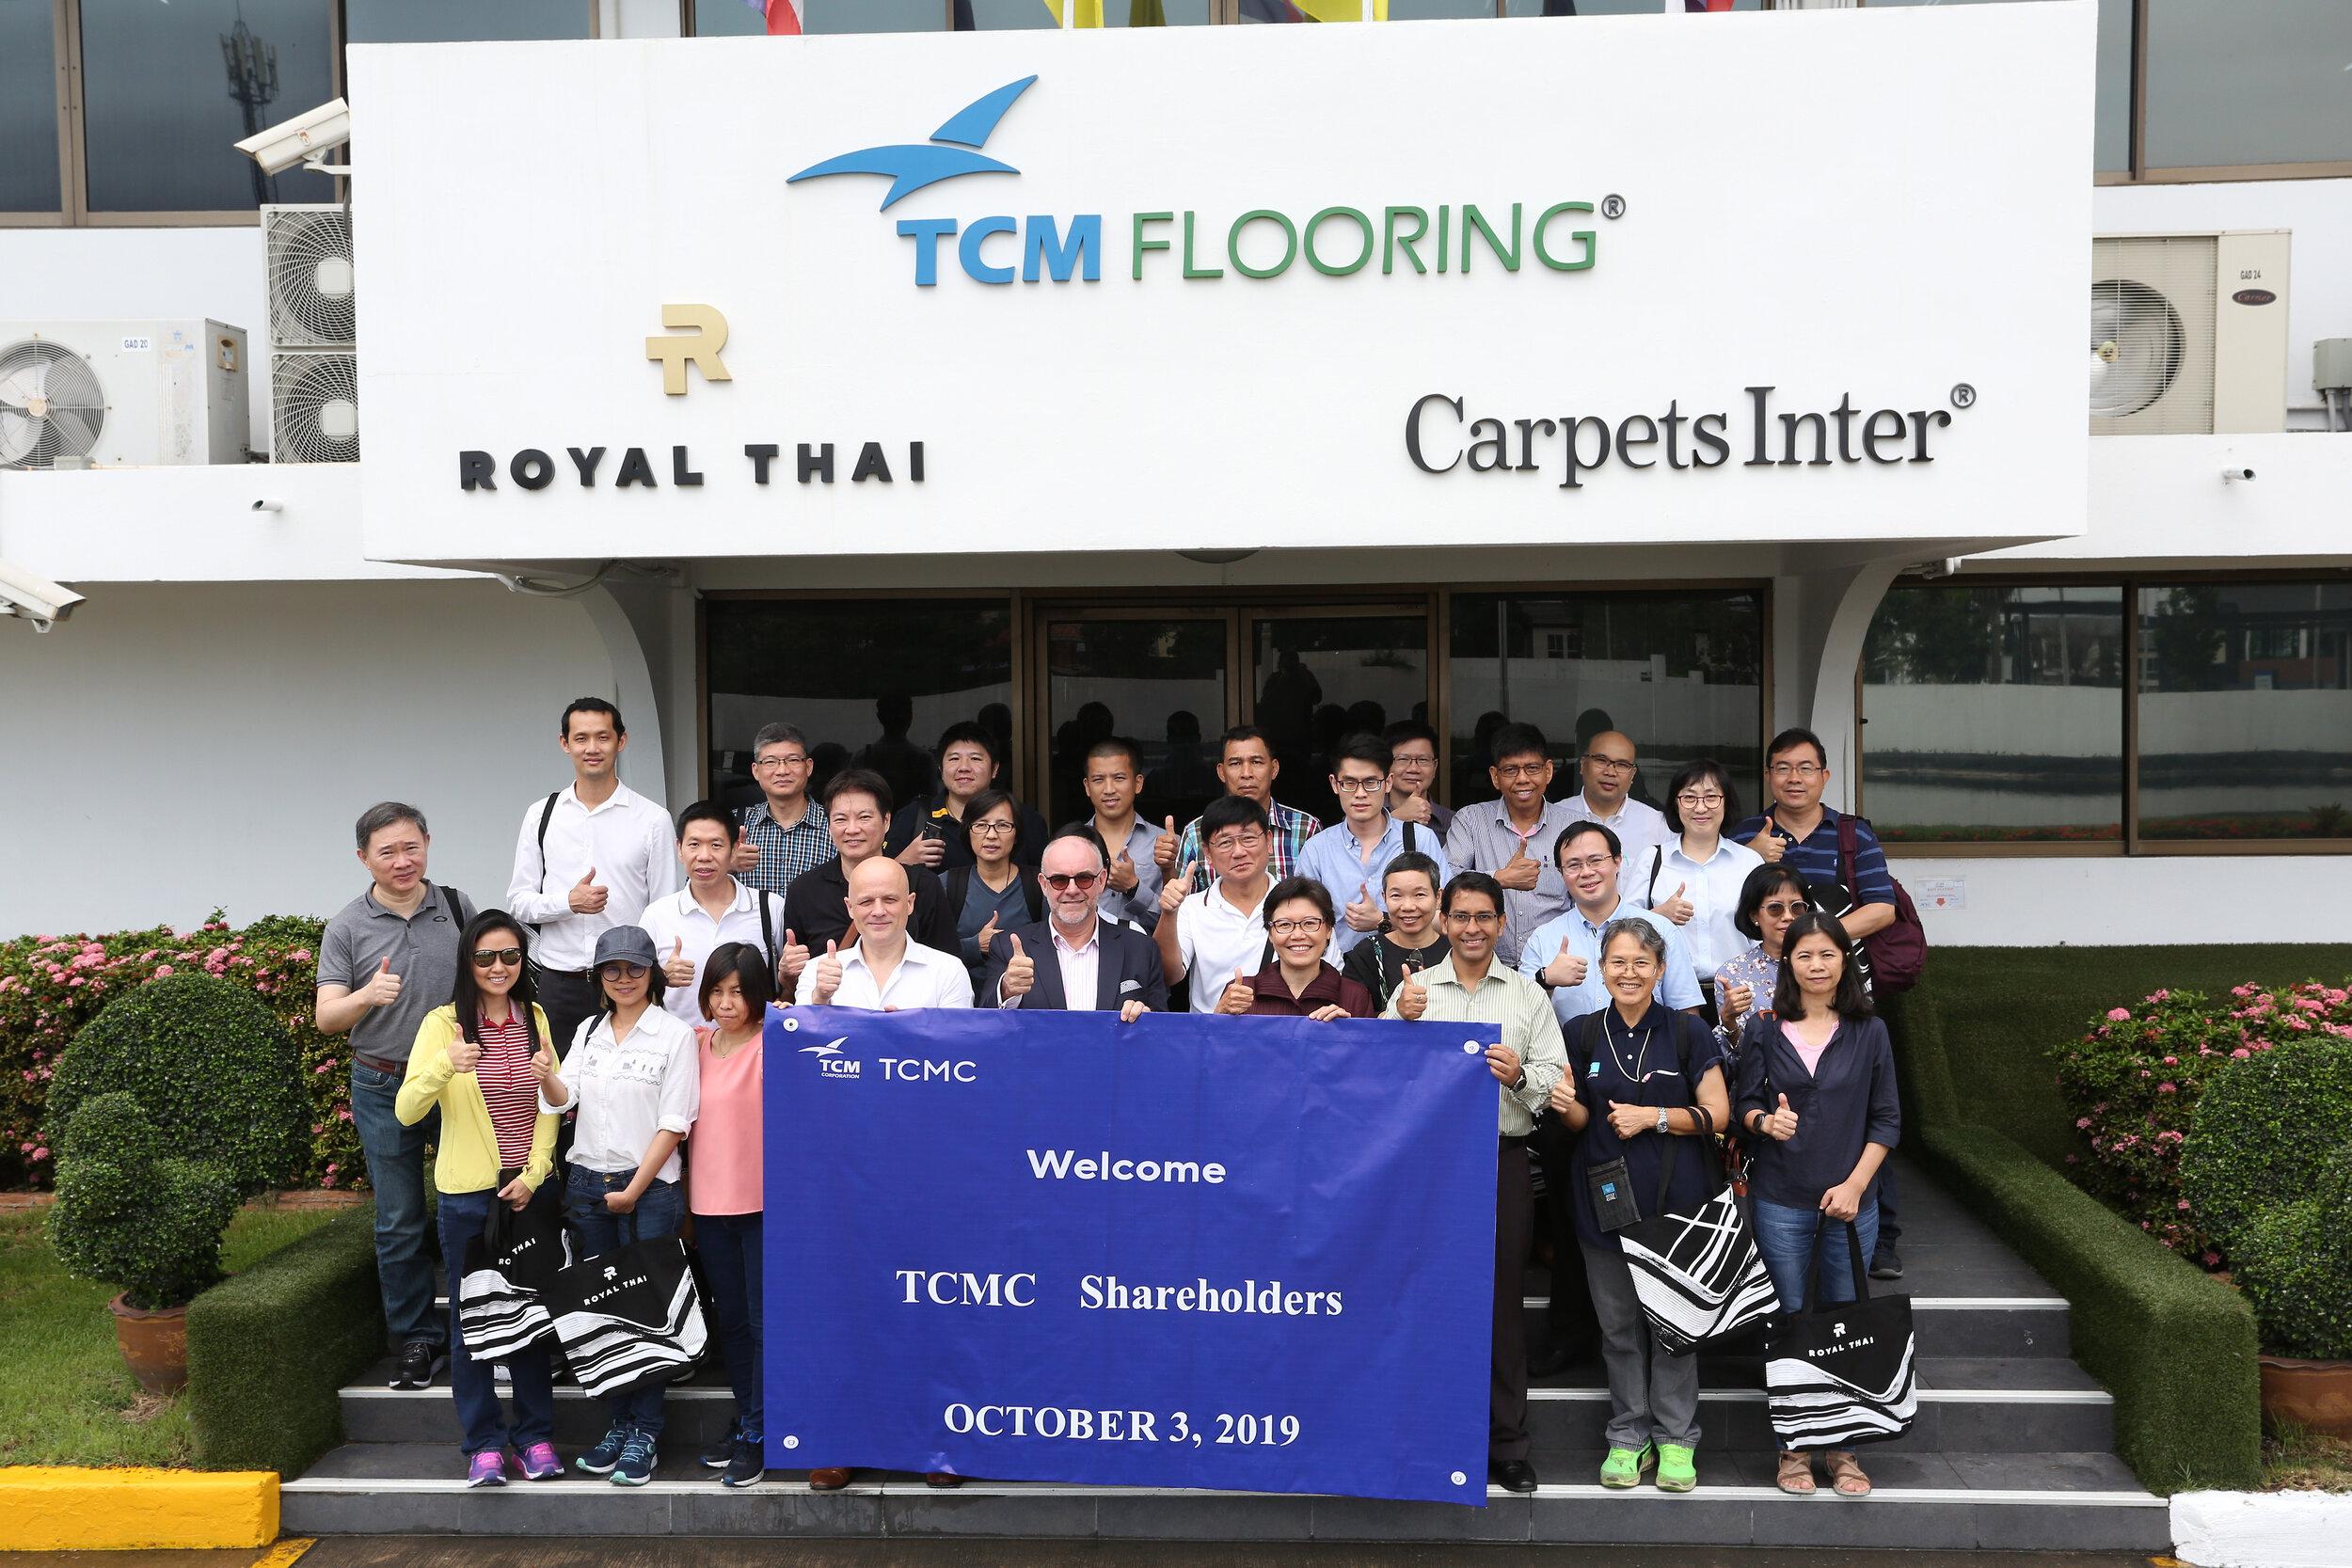 20191003_TCM Room_115.JPG